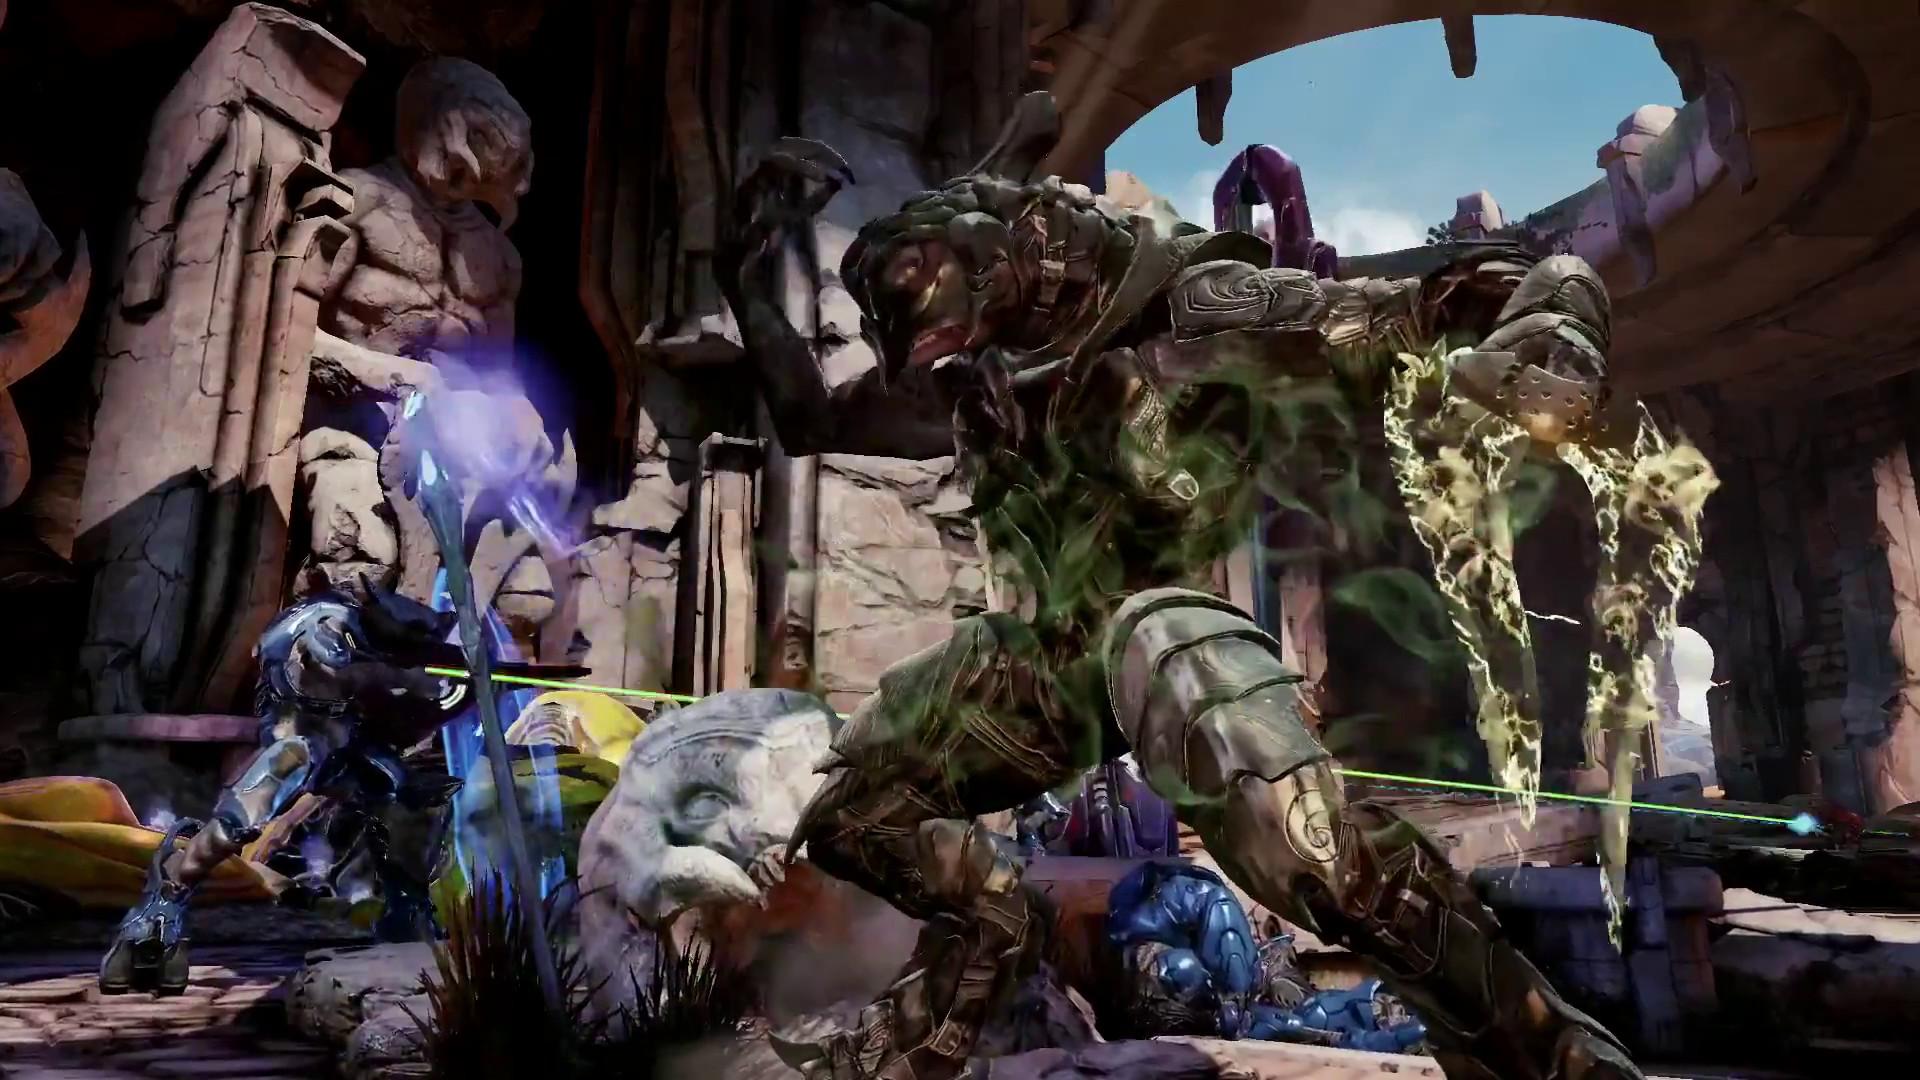 Res: 1920x1080, Killer Instinct Season 3 Halo Arbiter Announcement   The Escapist